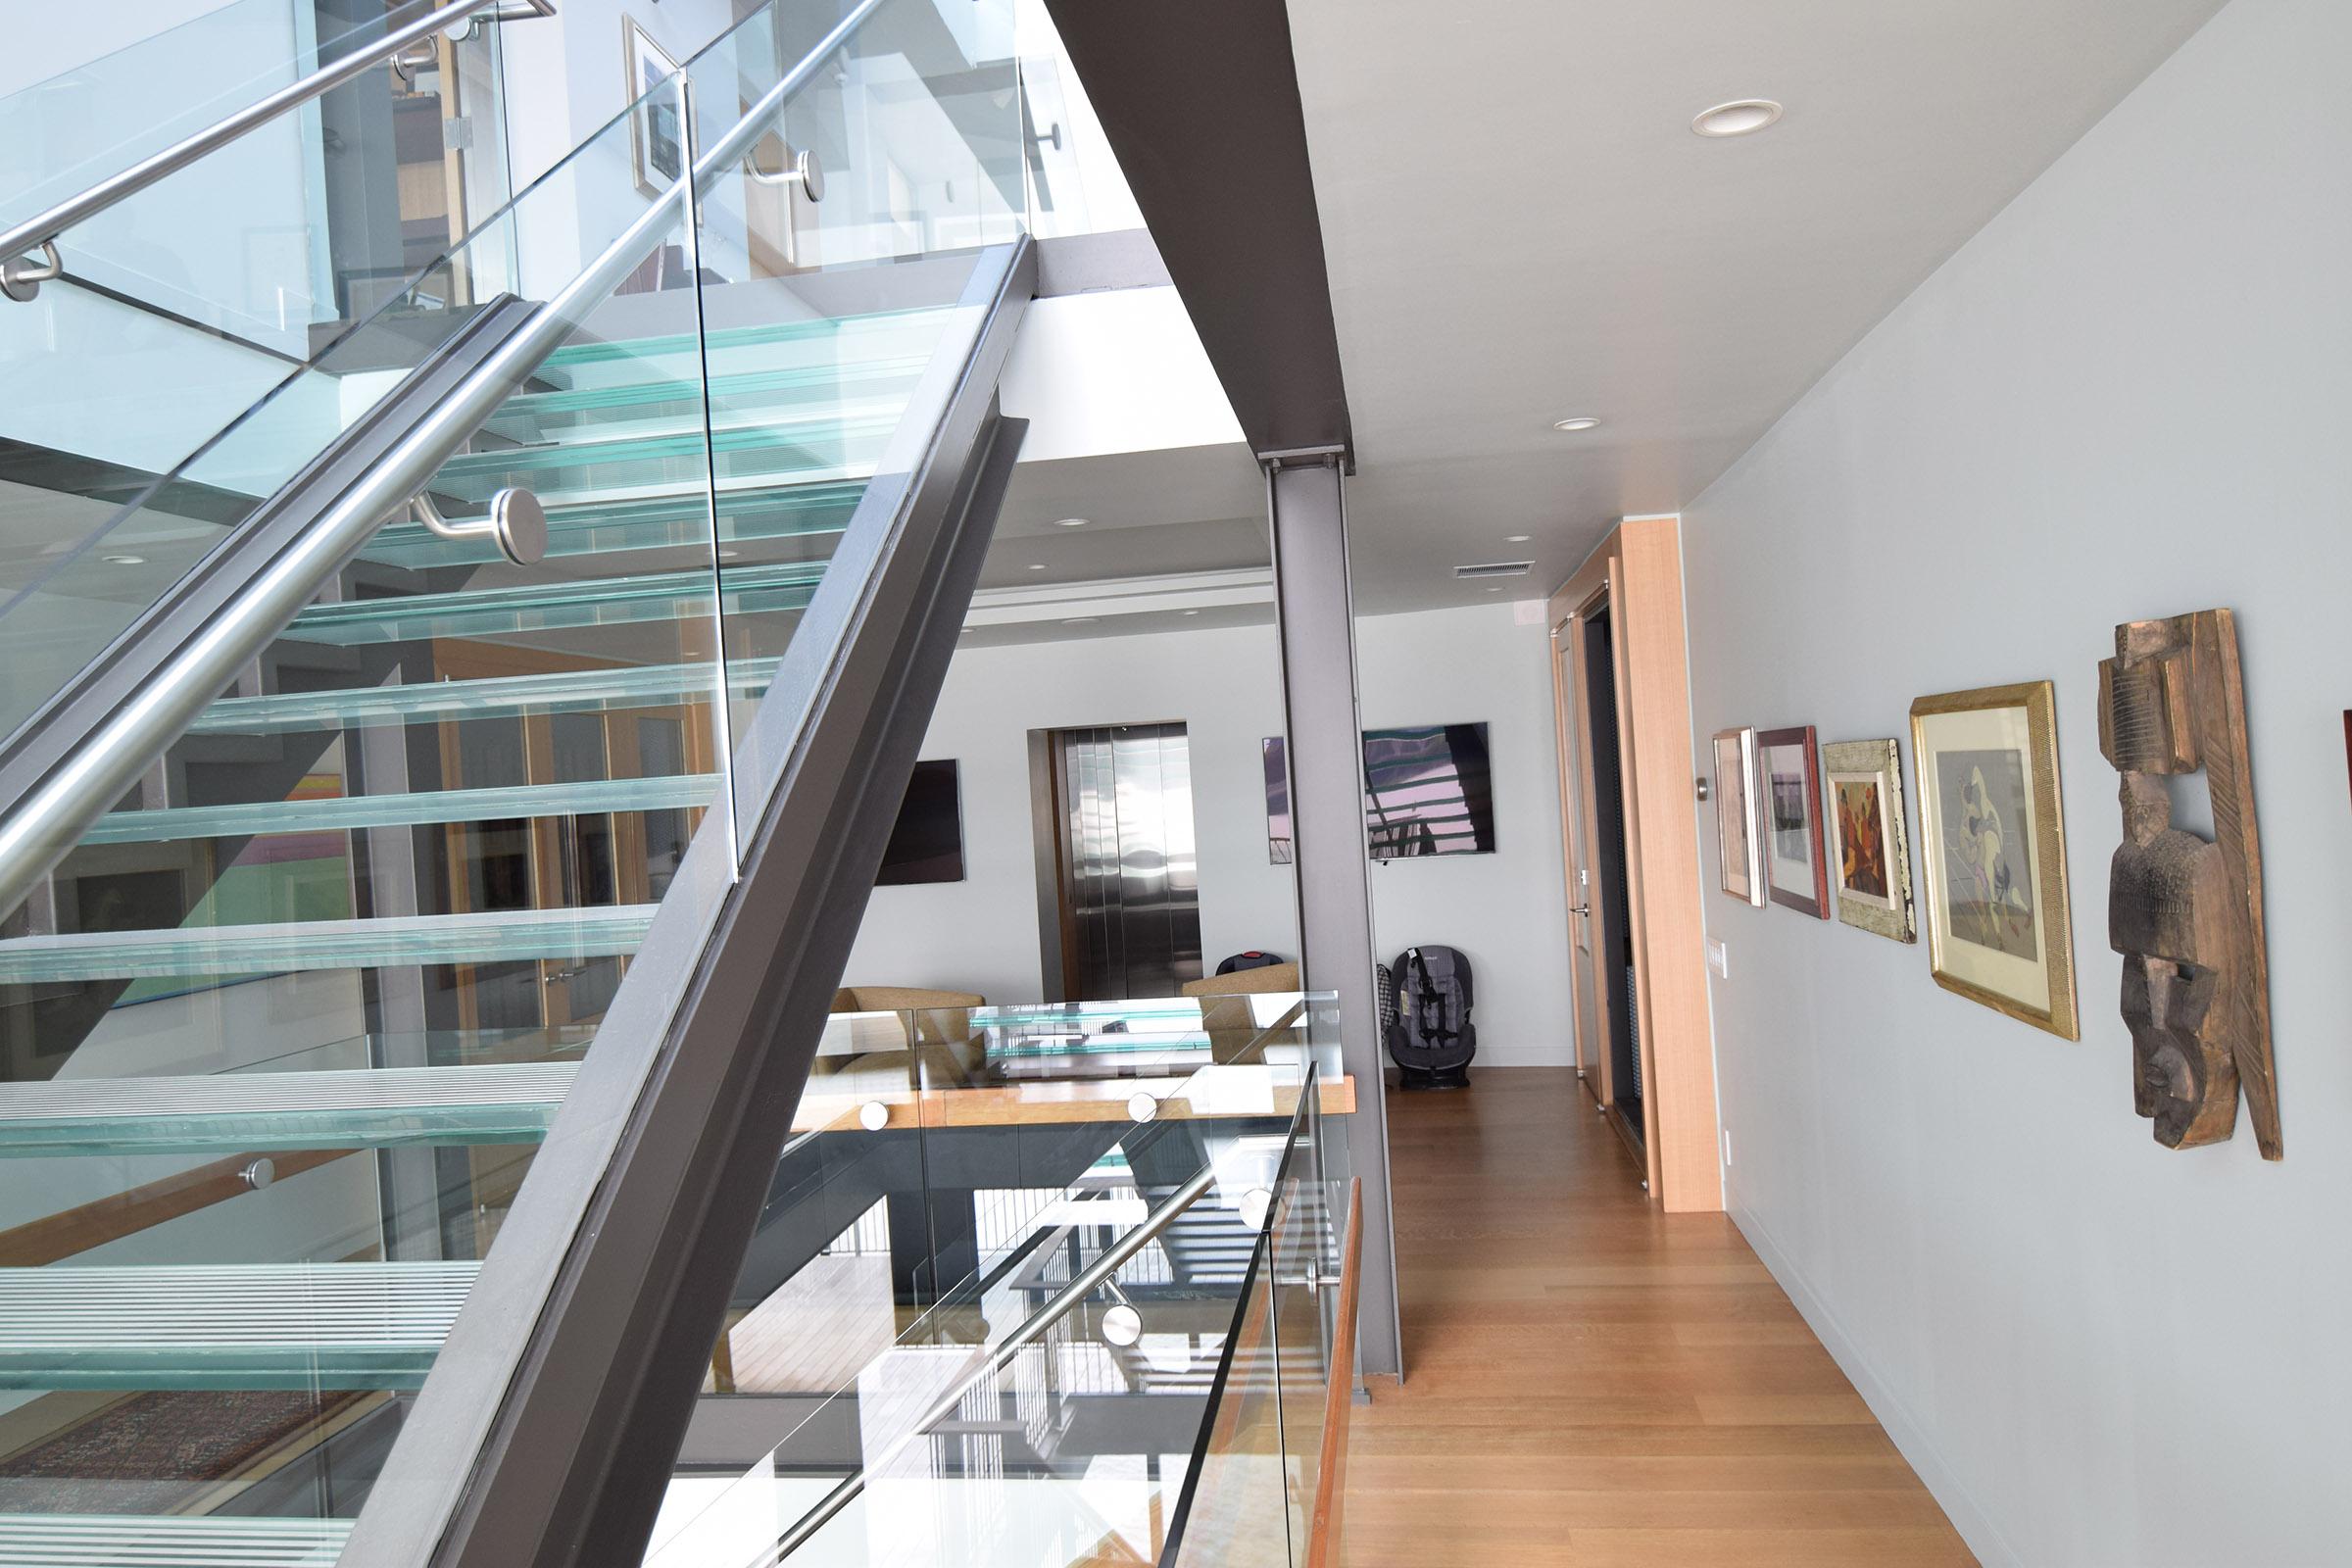 Staircase view to custom Rift Anigre Elevator & two Rift Anigre Wine Closets with Walnut Interiors